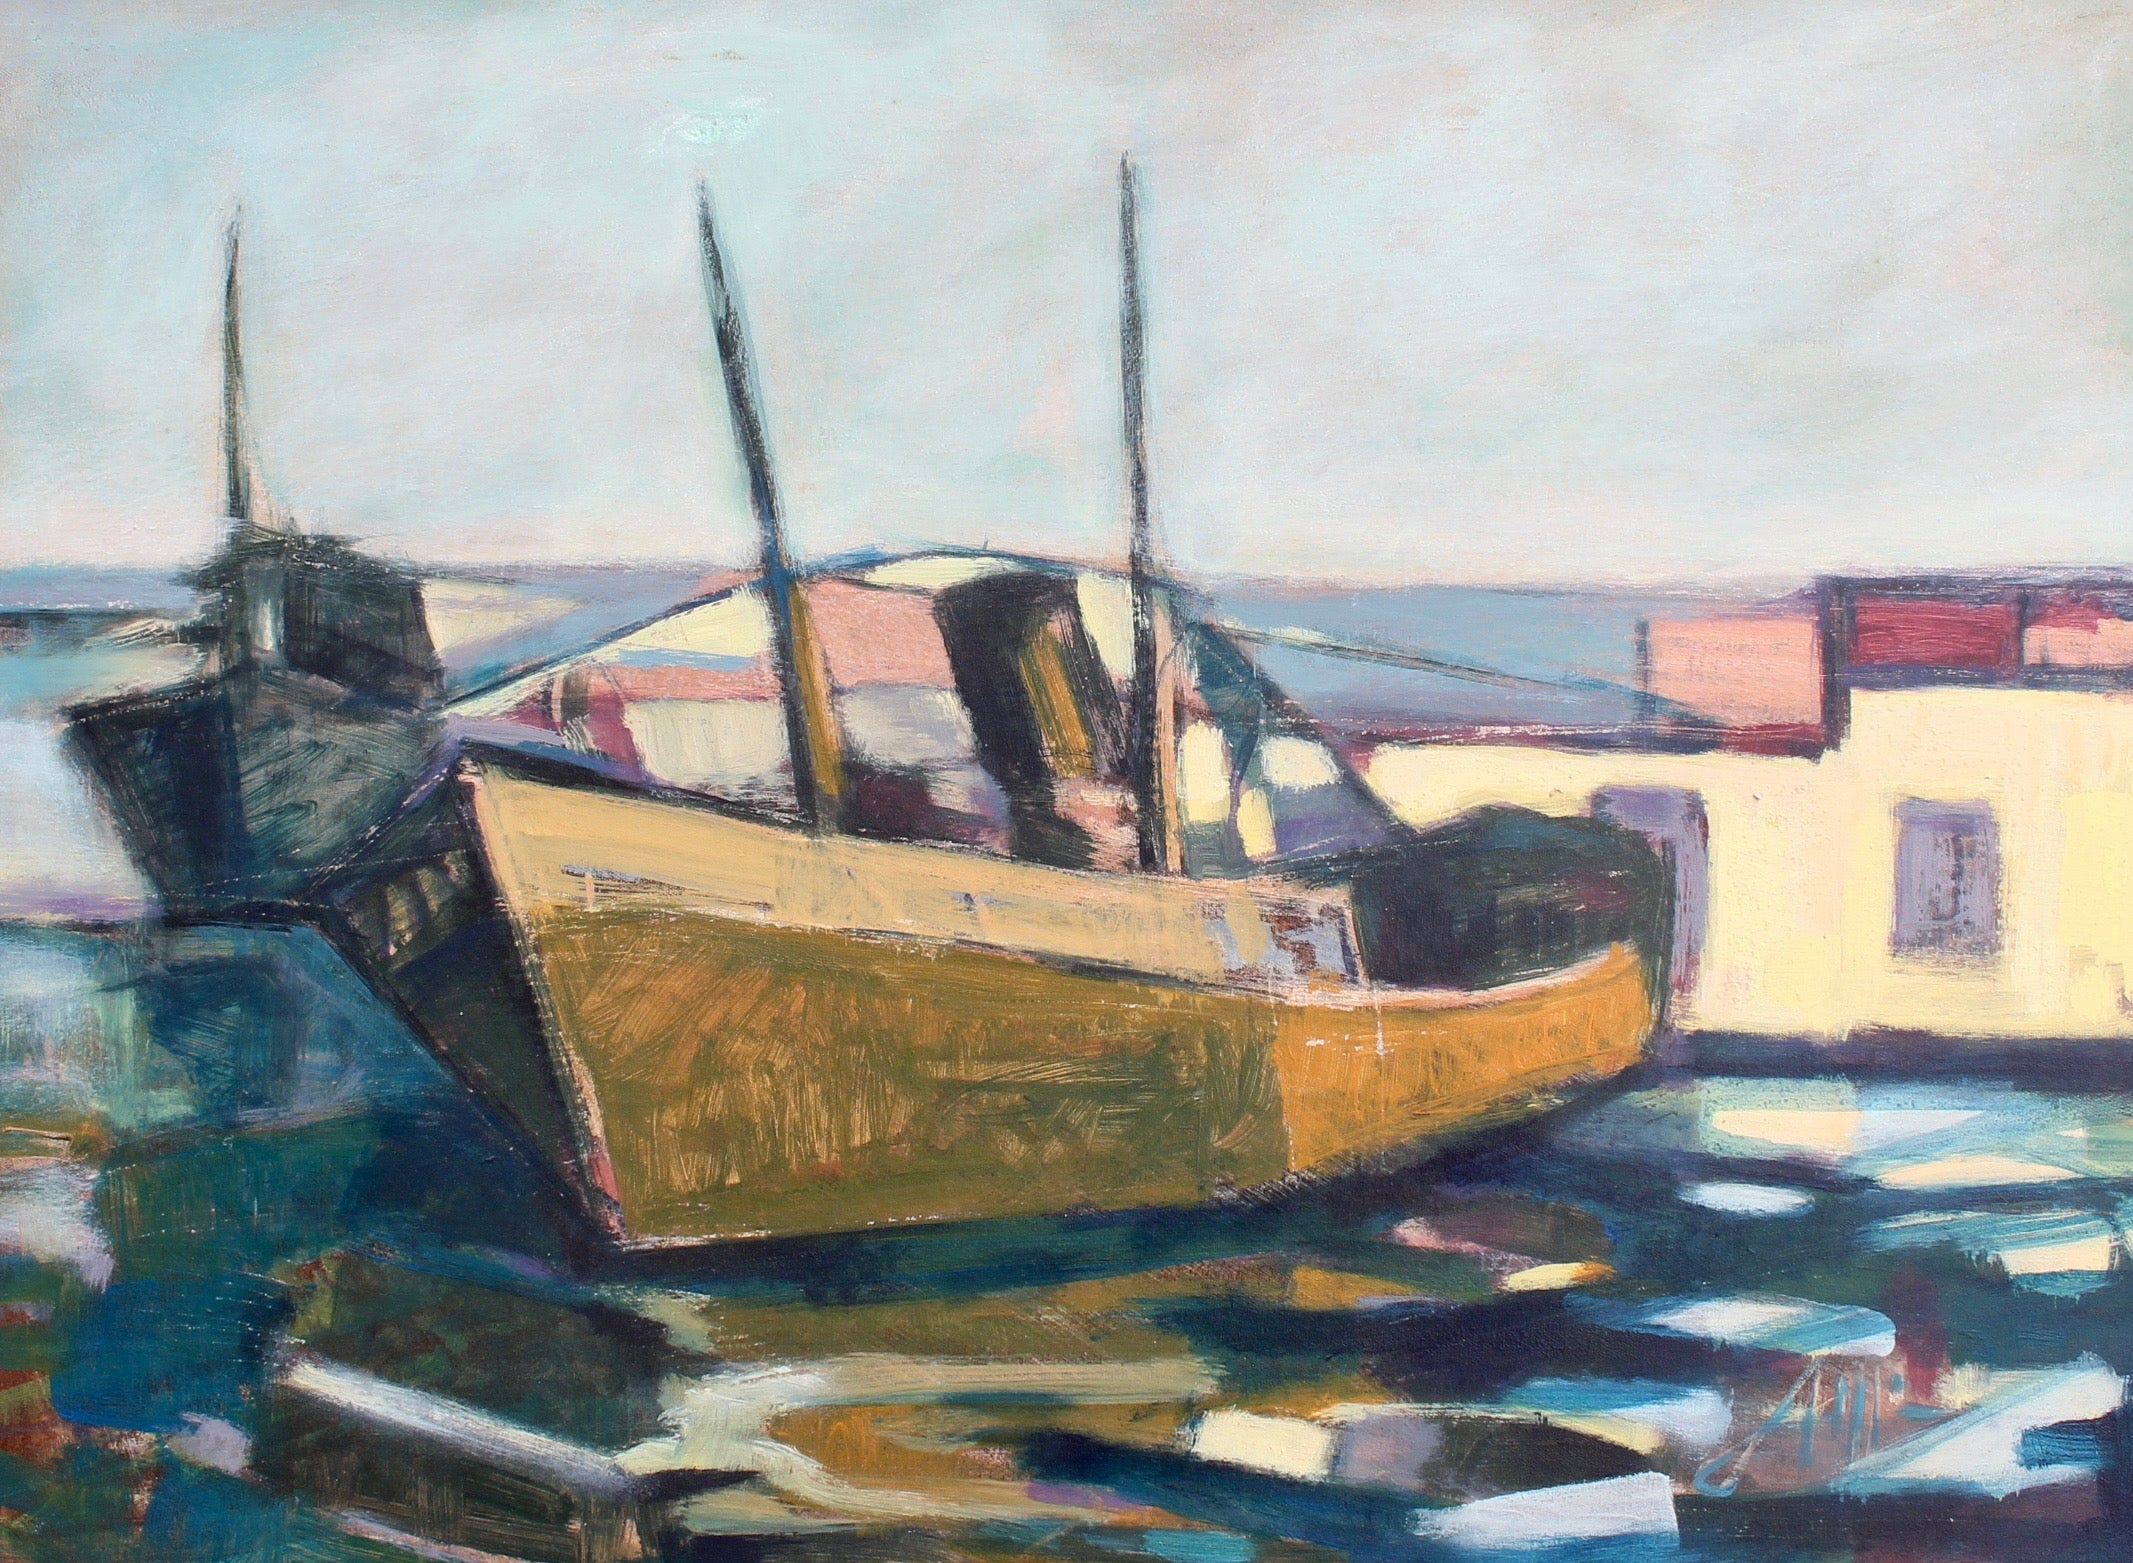 'Old Fishing Boat', Italian Tuscan School